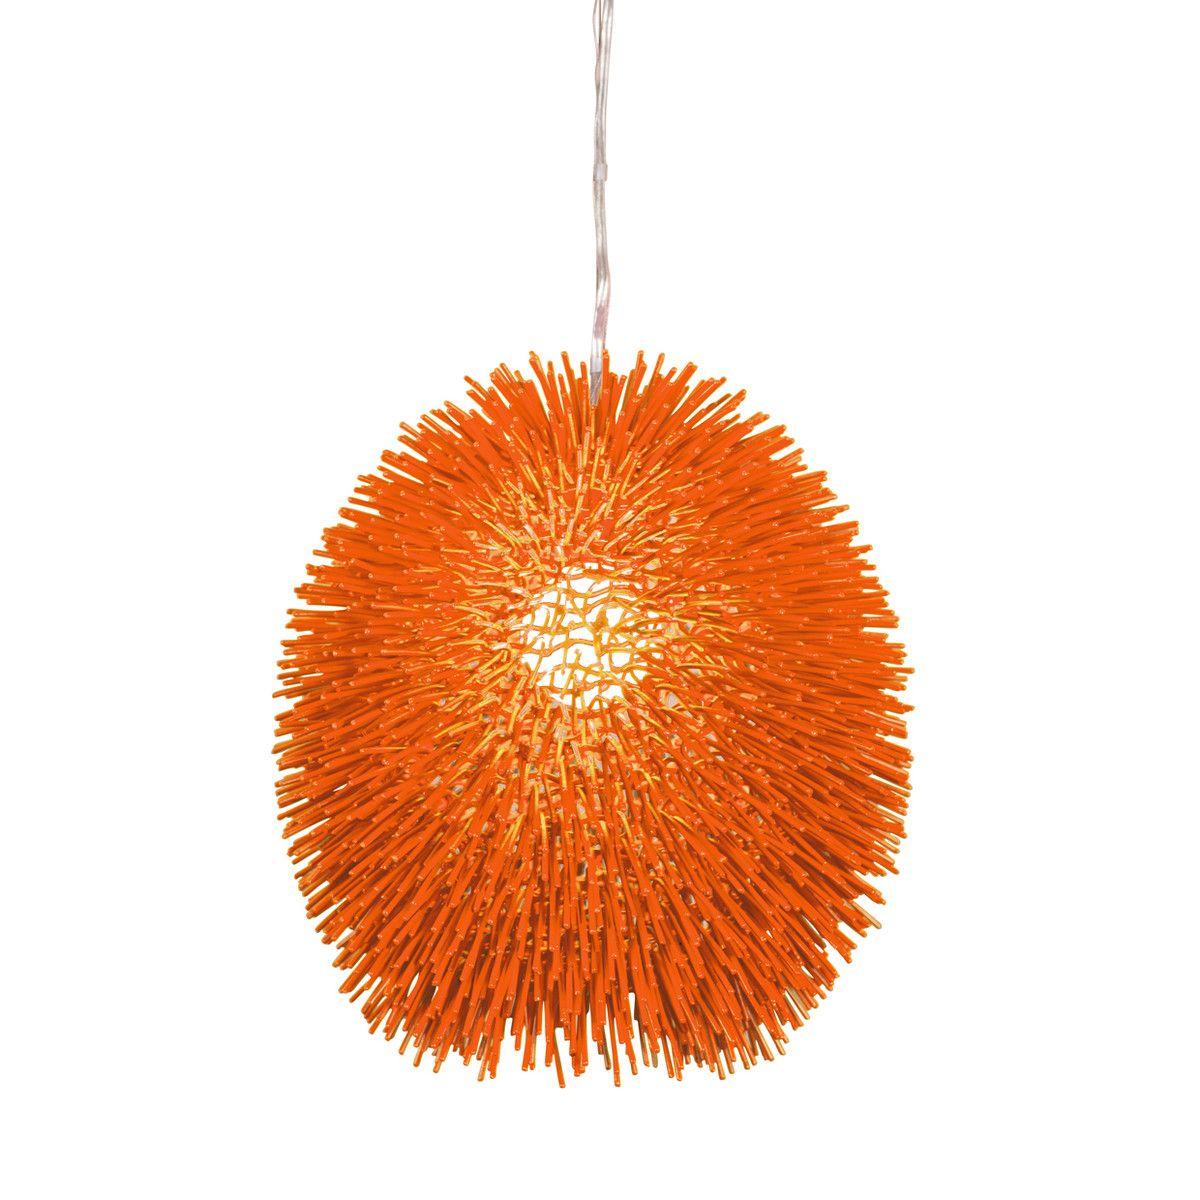 Orange urchin pendant light (by Fab.com)  sc 1 st  Pinterest & Orange urchin pendant light (by Fab.com) | ORANGE | Pinterest ... azcodes.com